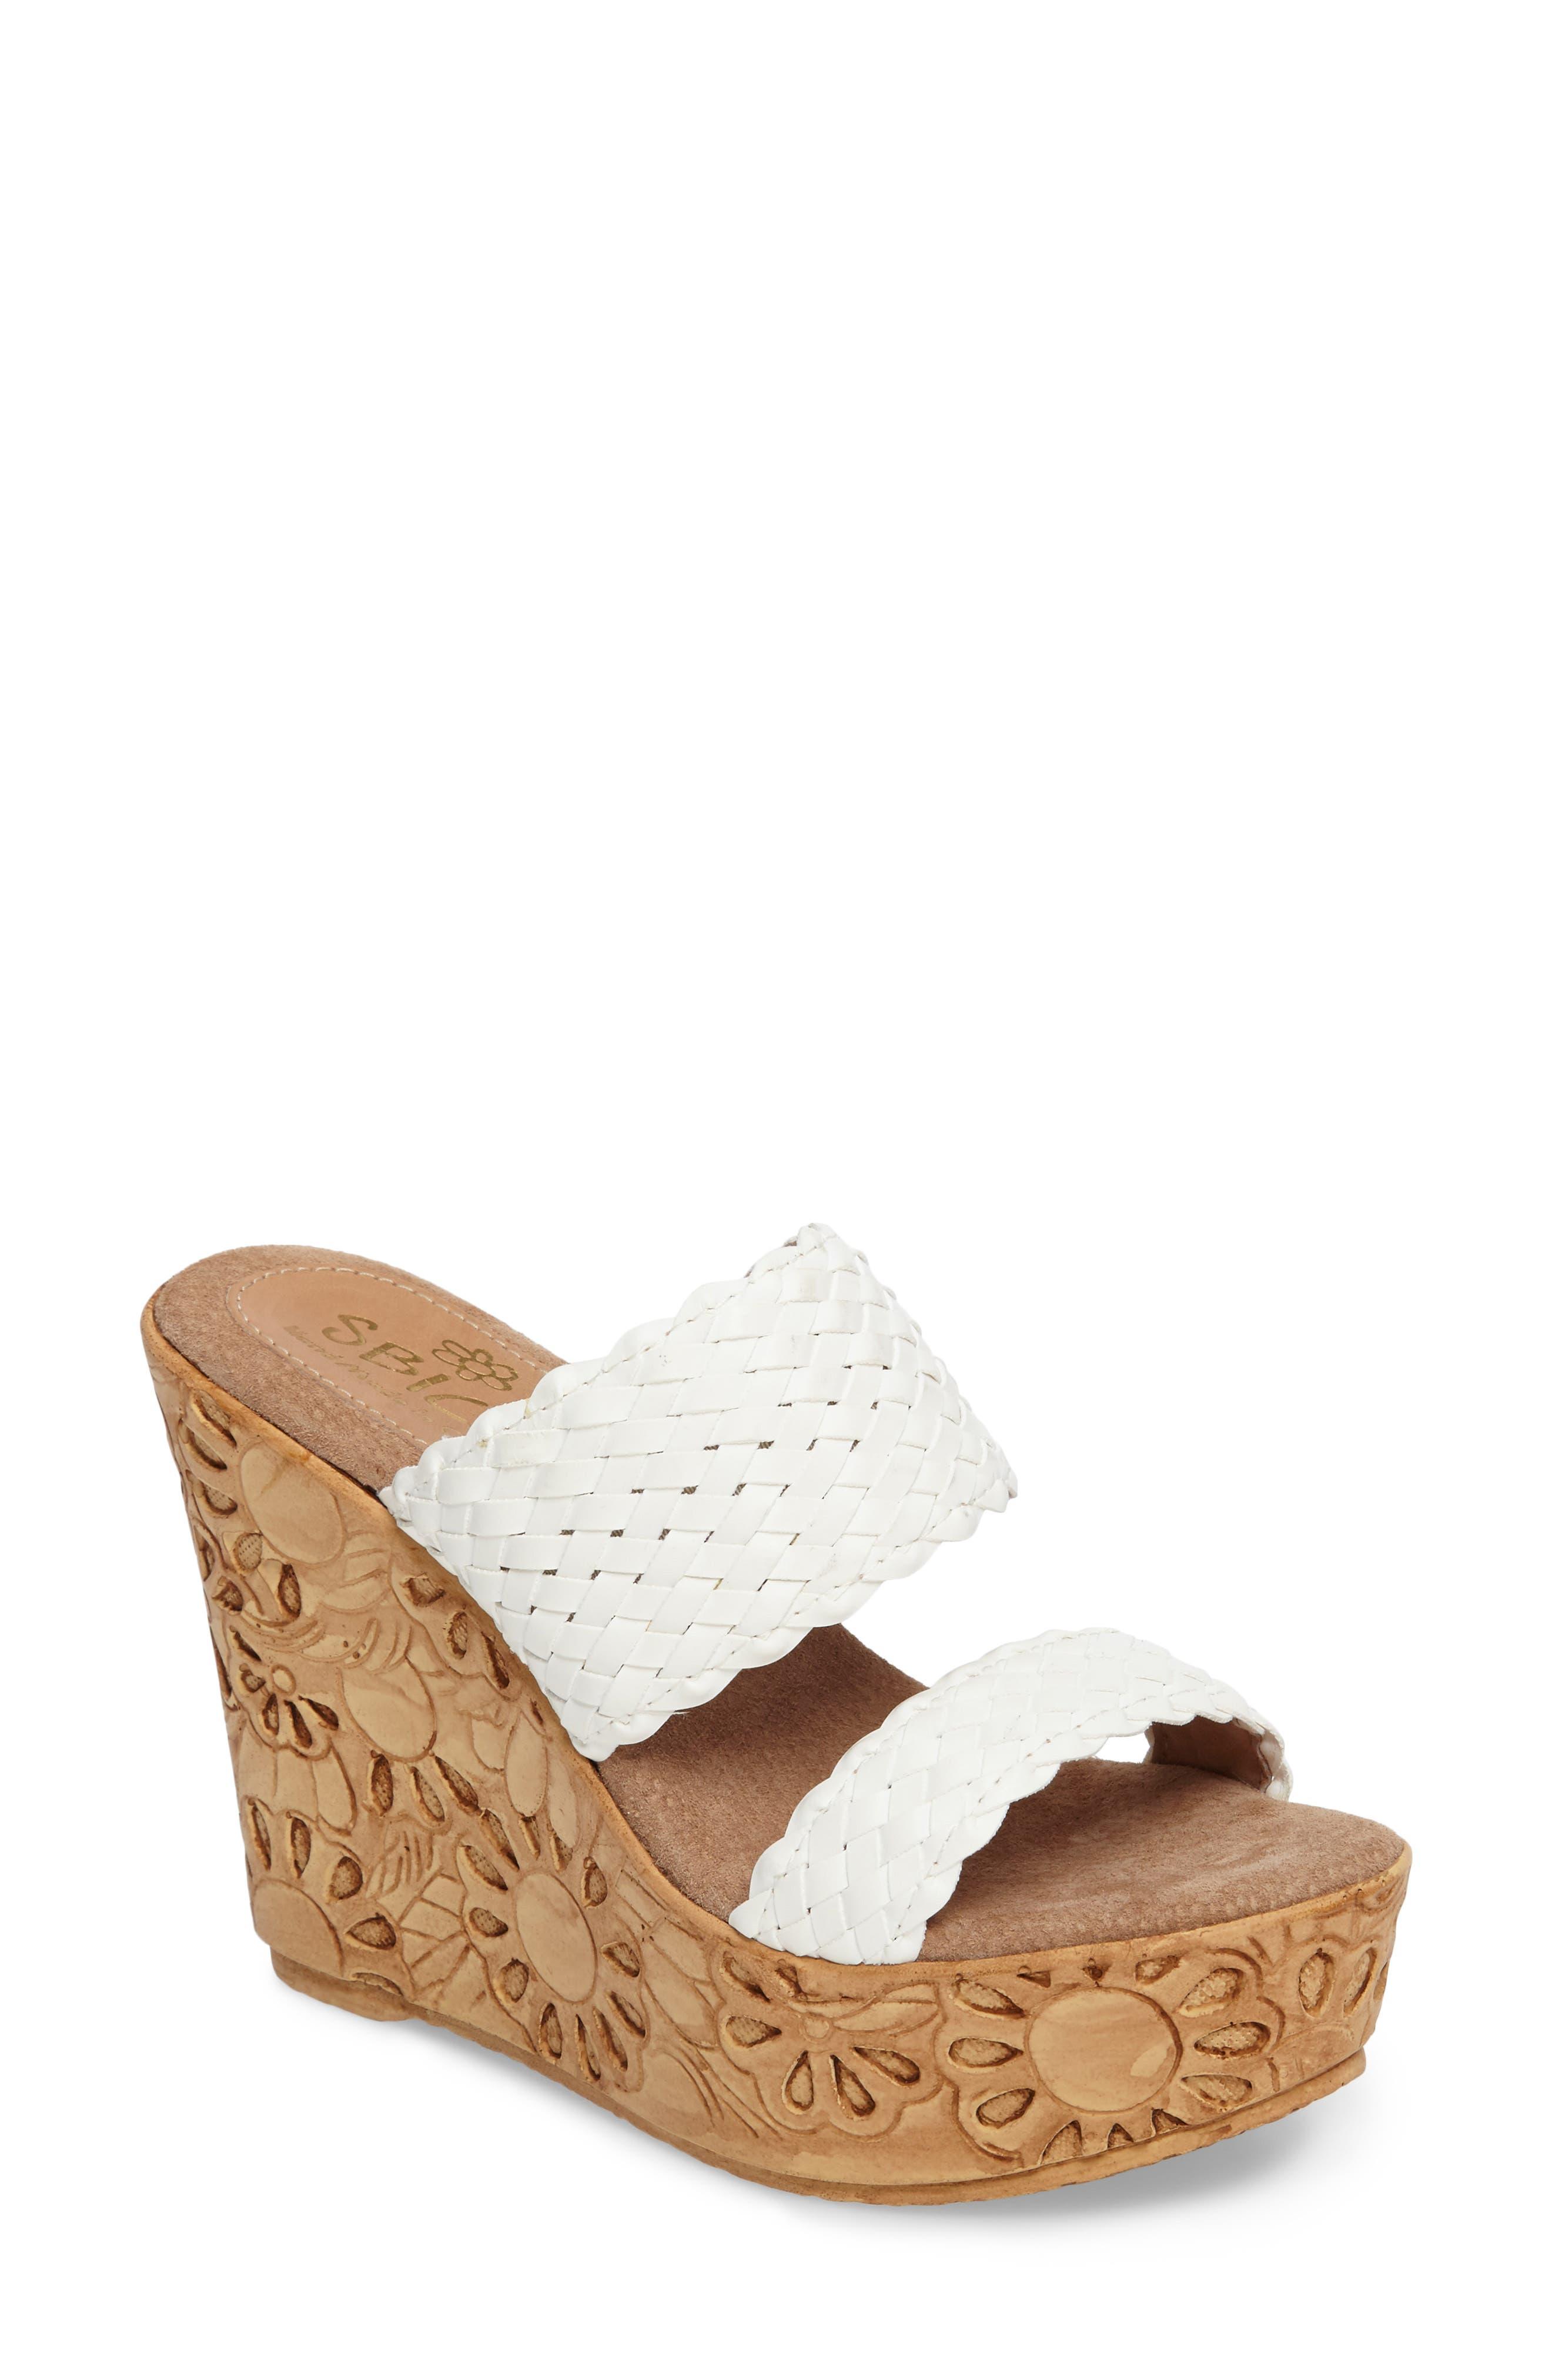 Halima Platform Wedge Sandal,                         Main,                         color, White Leather